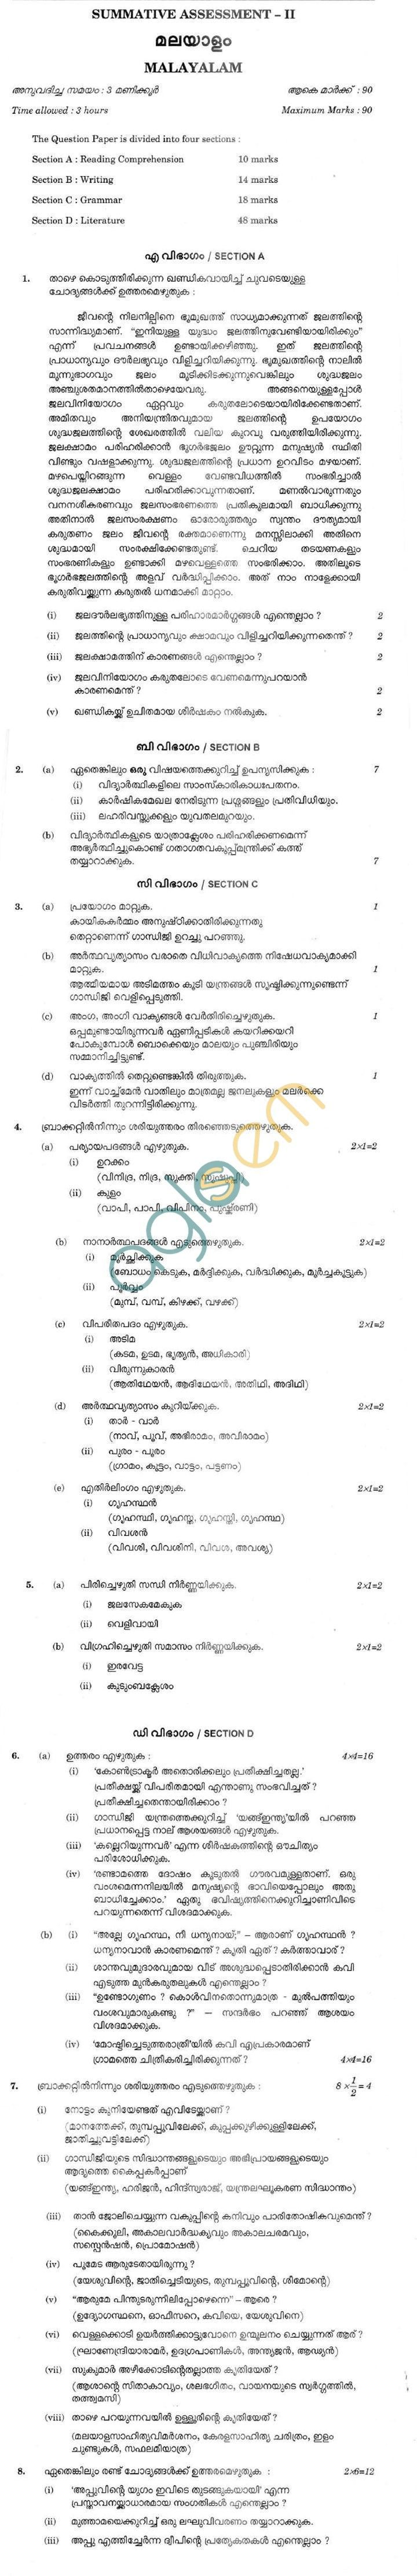 CBSE Board Exam Class 10 SA2 Sample Question Paper –Malayalam